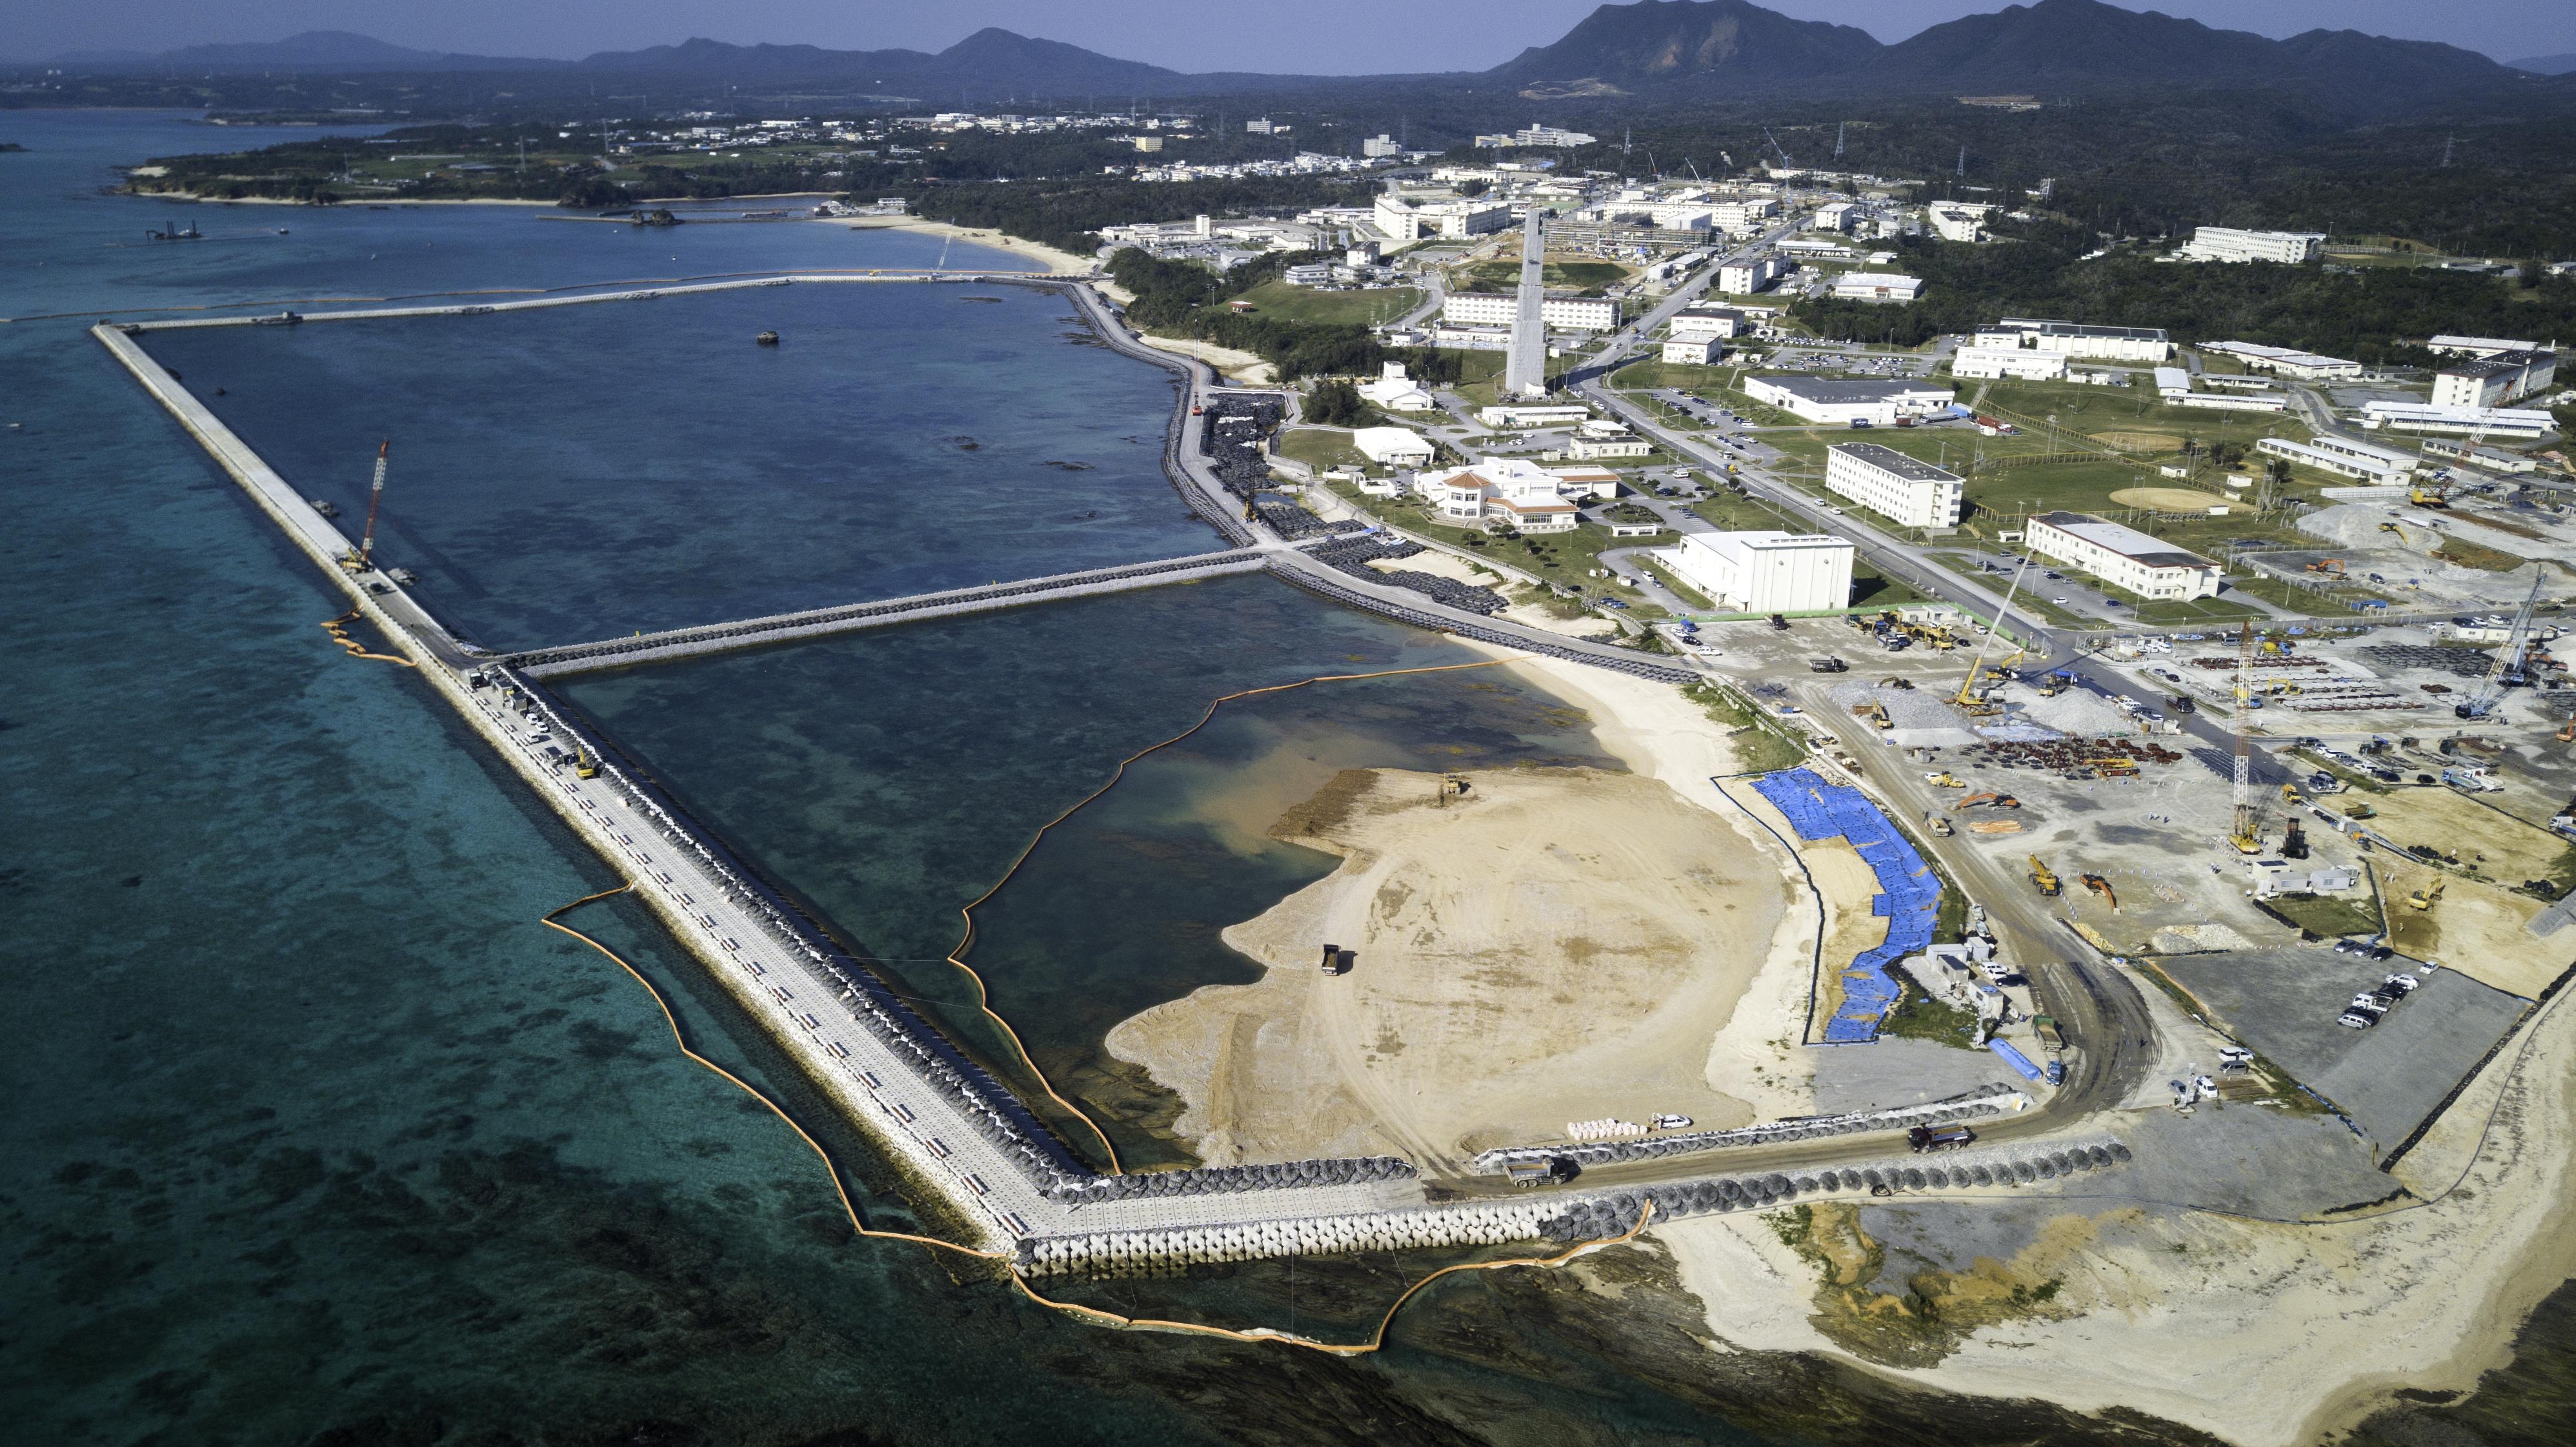 time.com - Mari Yamaguchi / AP - Dozens of Marines on Japan's Okinawa Infected With COVID-19